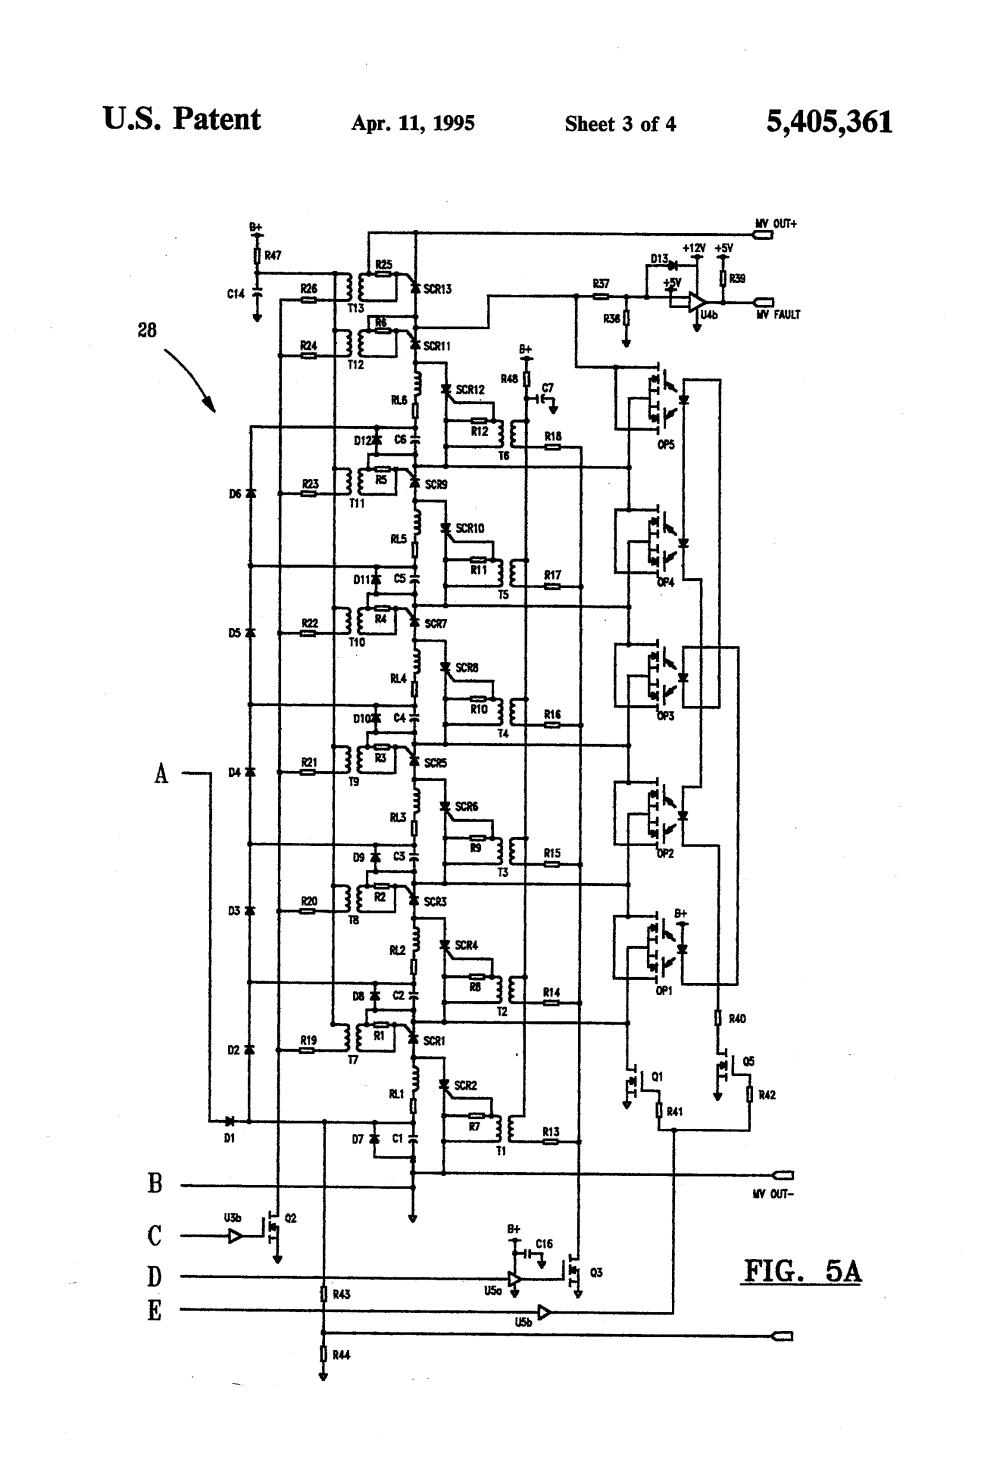 medium resolution of us5405361 3 patent us5405361 external defibrillator circuit google patents 1992 honda cbr 600 honda cbr 600 f2 wiring diagram